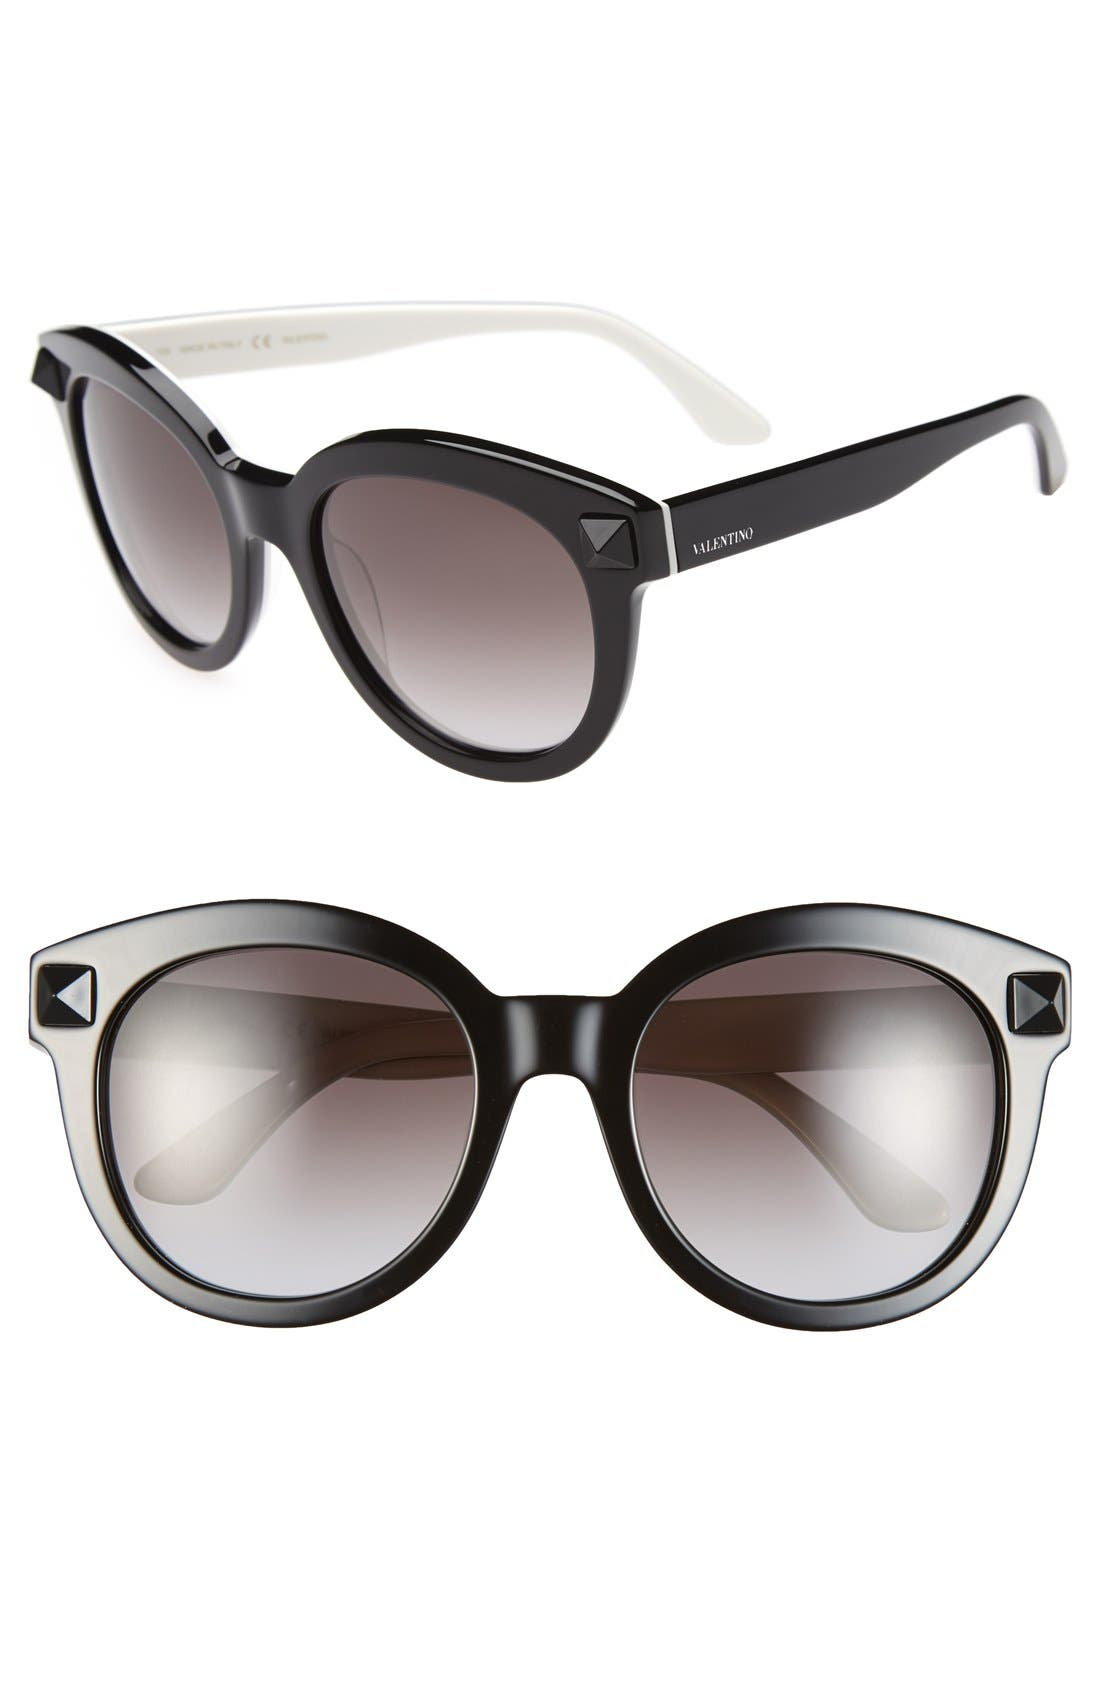 VALENTINO, 'Rockstud' 54mm Semi Oval Cat Eye Sunglasses, Main thumbnail 1, color, 015